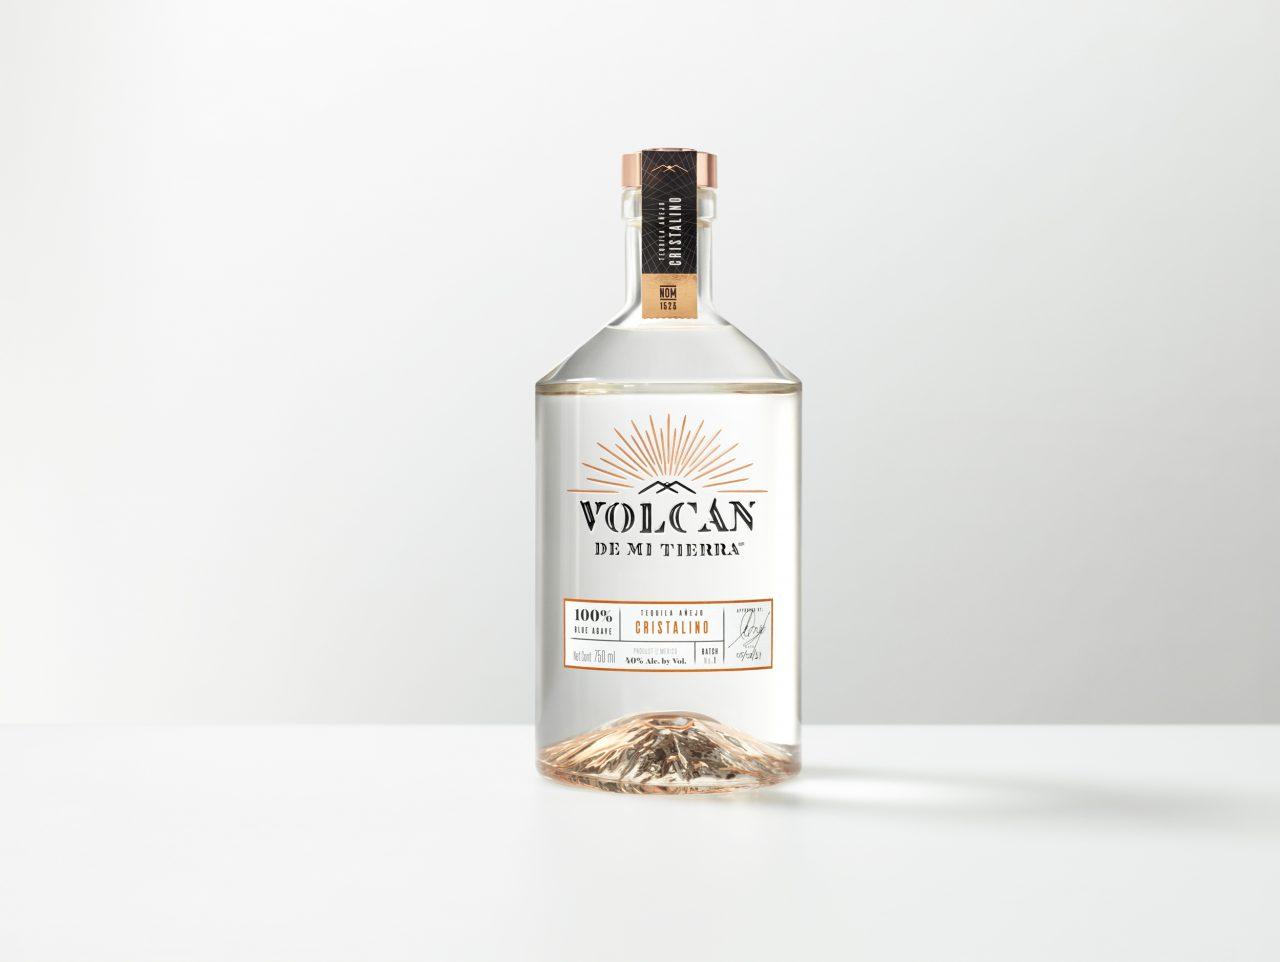 Un tequila de alta costura se desvela para conquistar internacionalmente